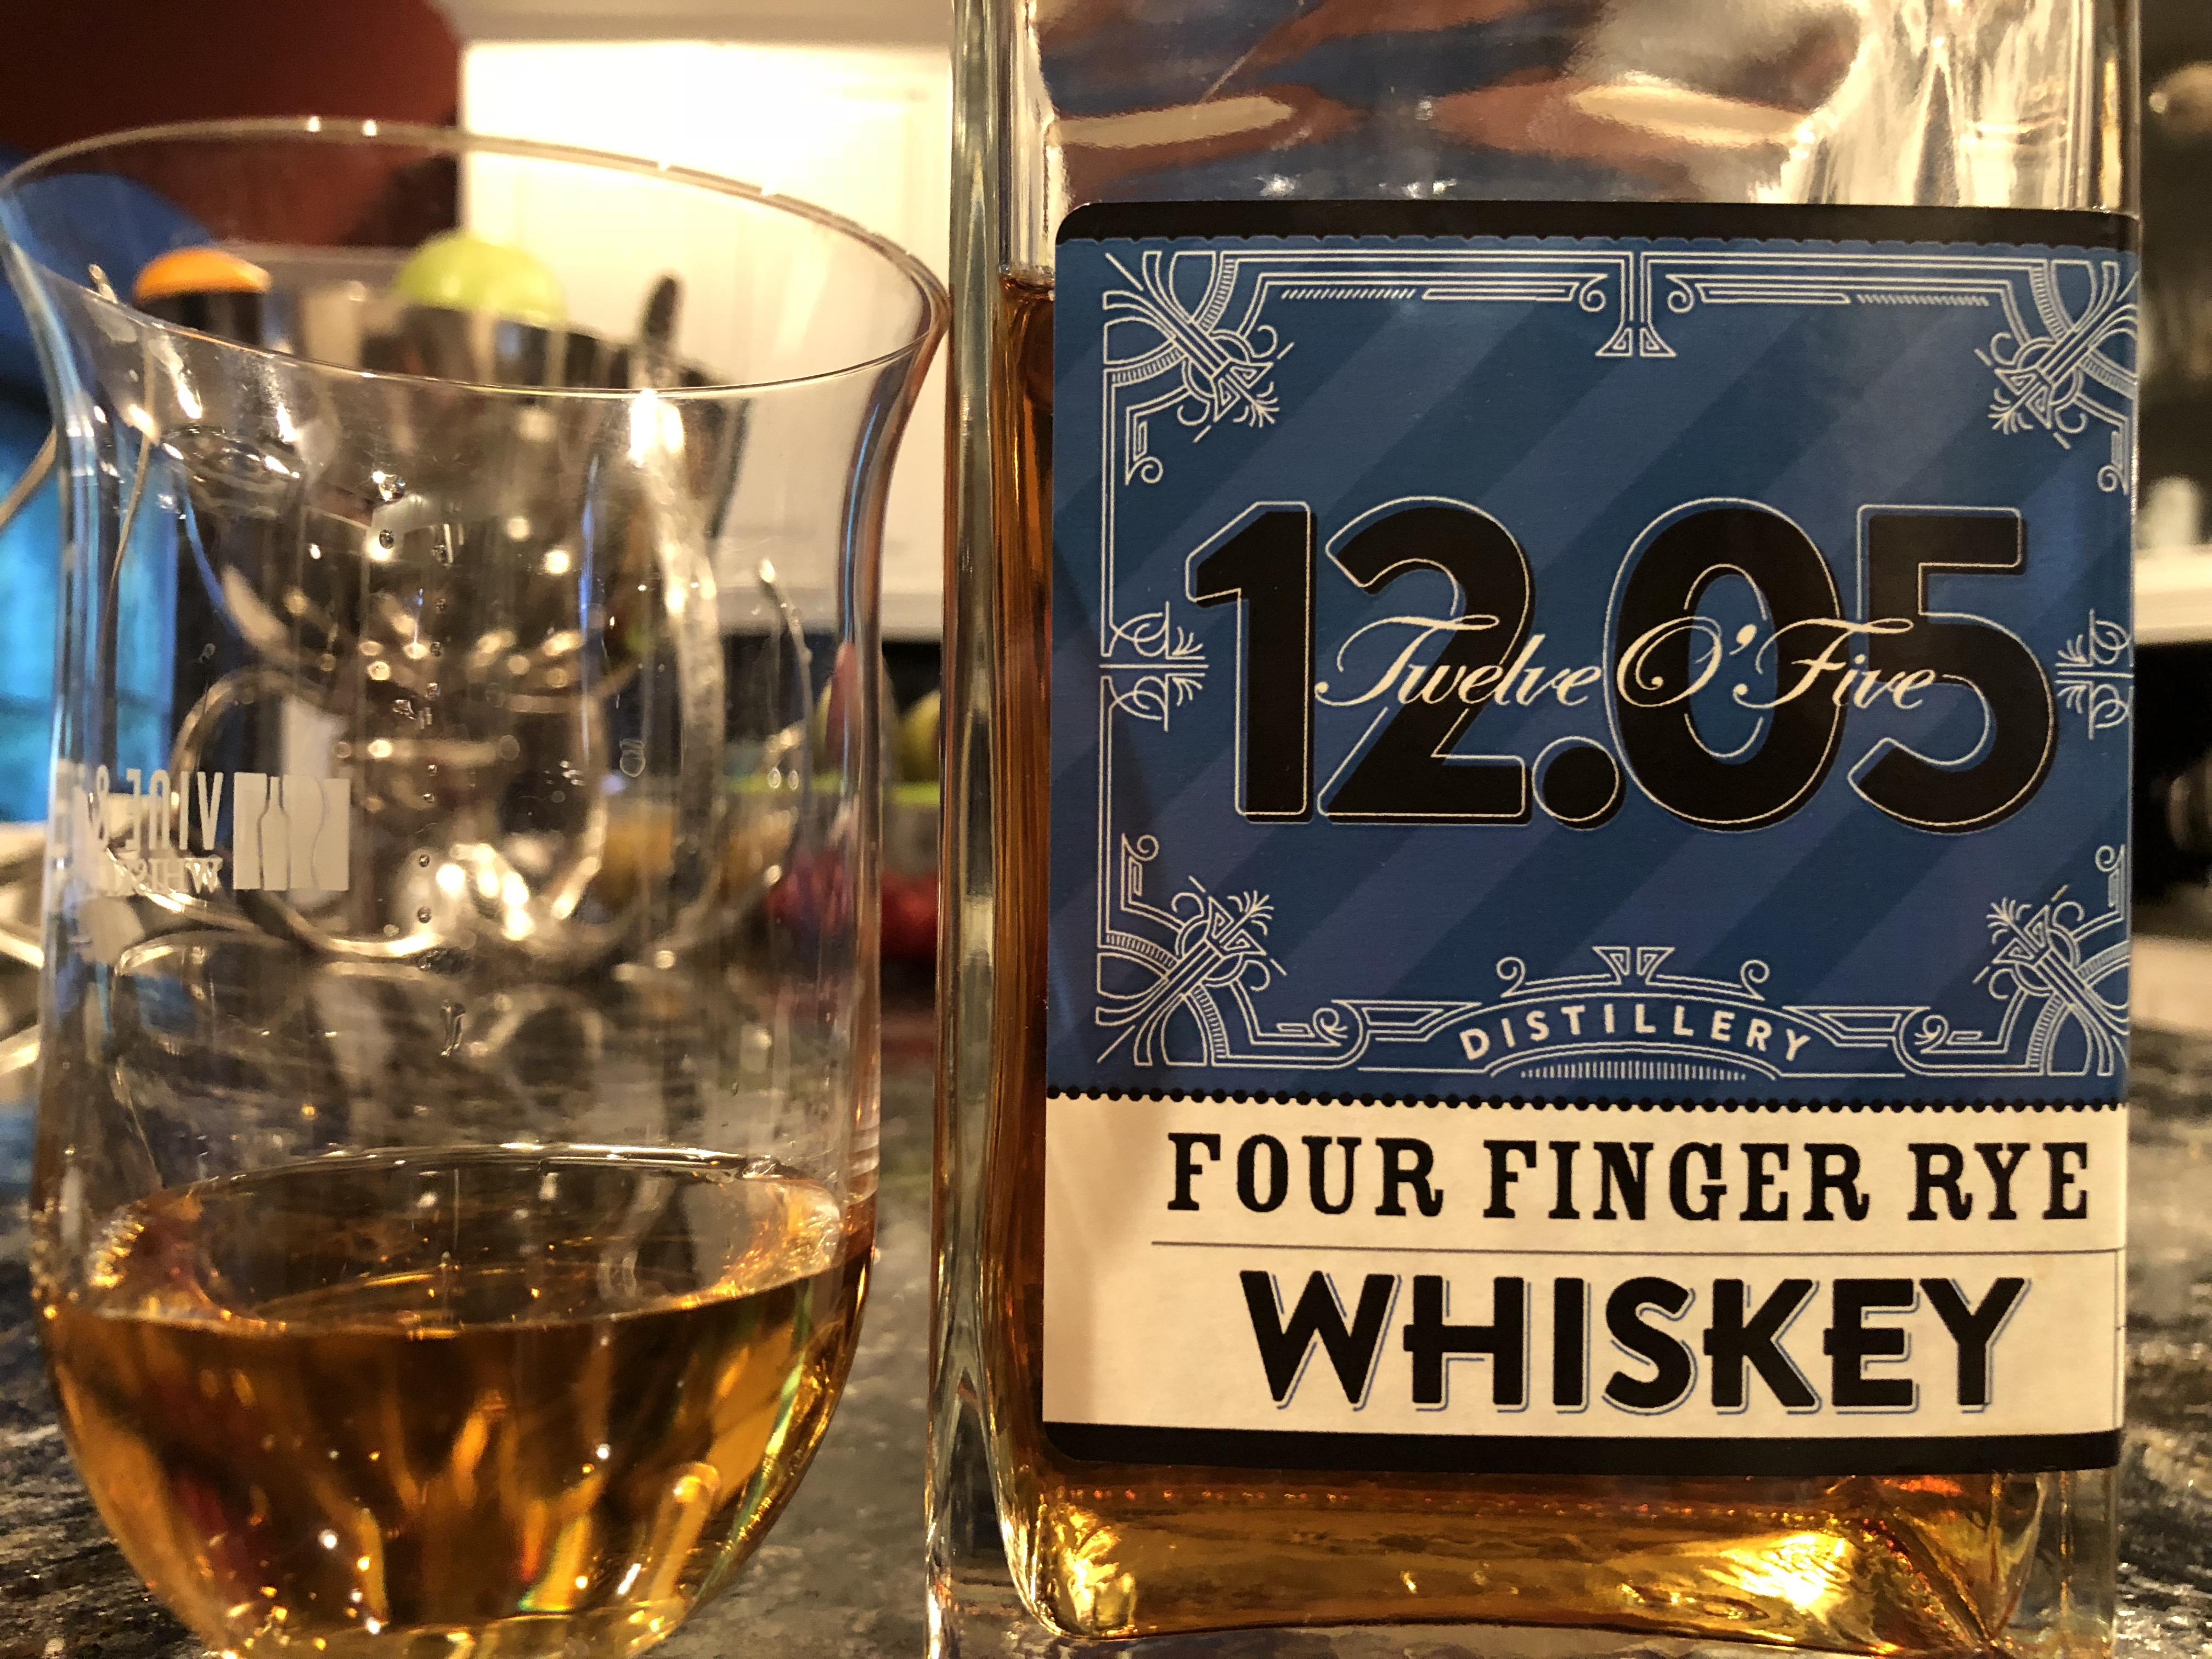 Twelve O?five Four Finger Rye Whiskey photo